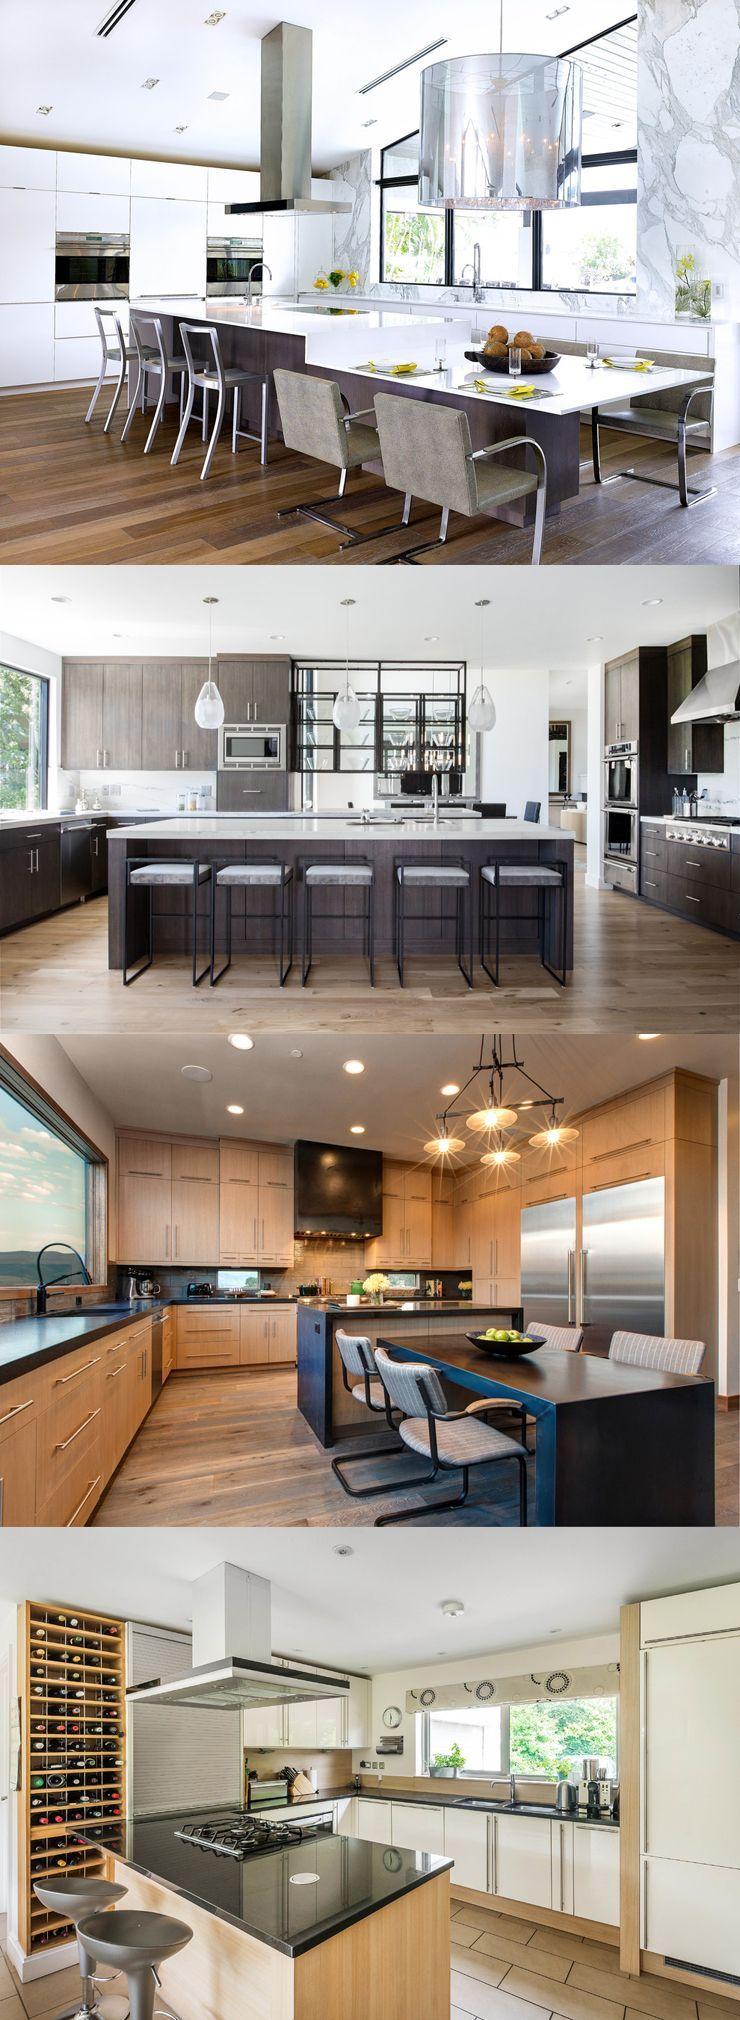 Clever Ways To Design Your Kitchen Island (Update